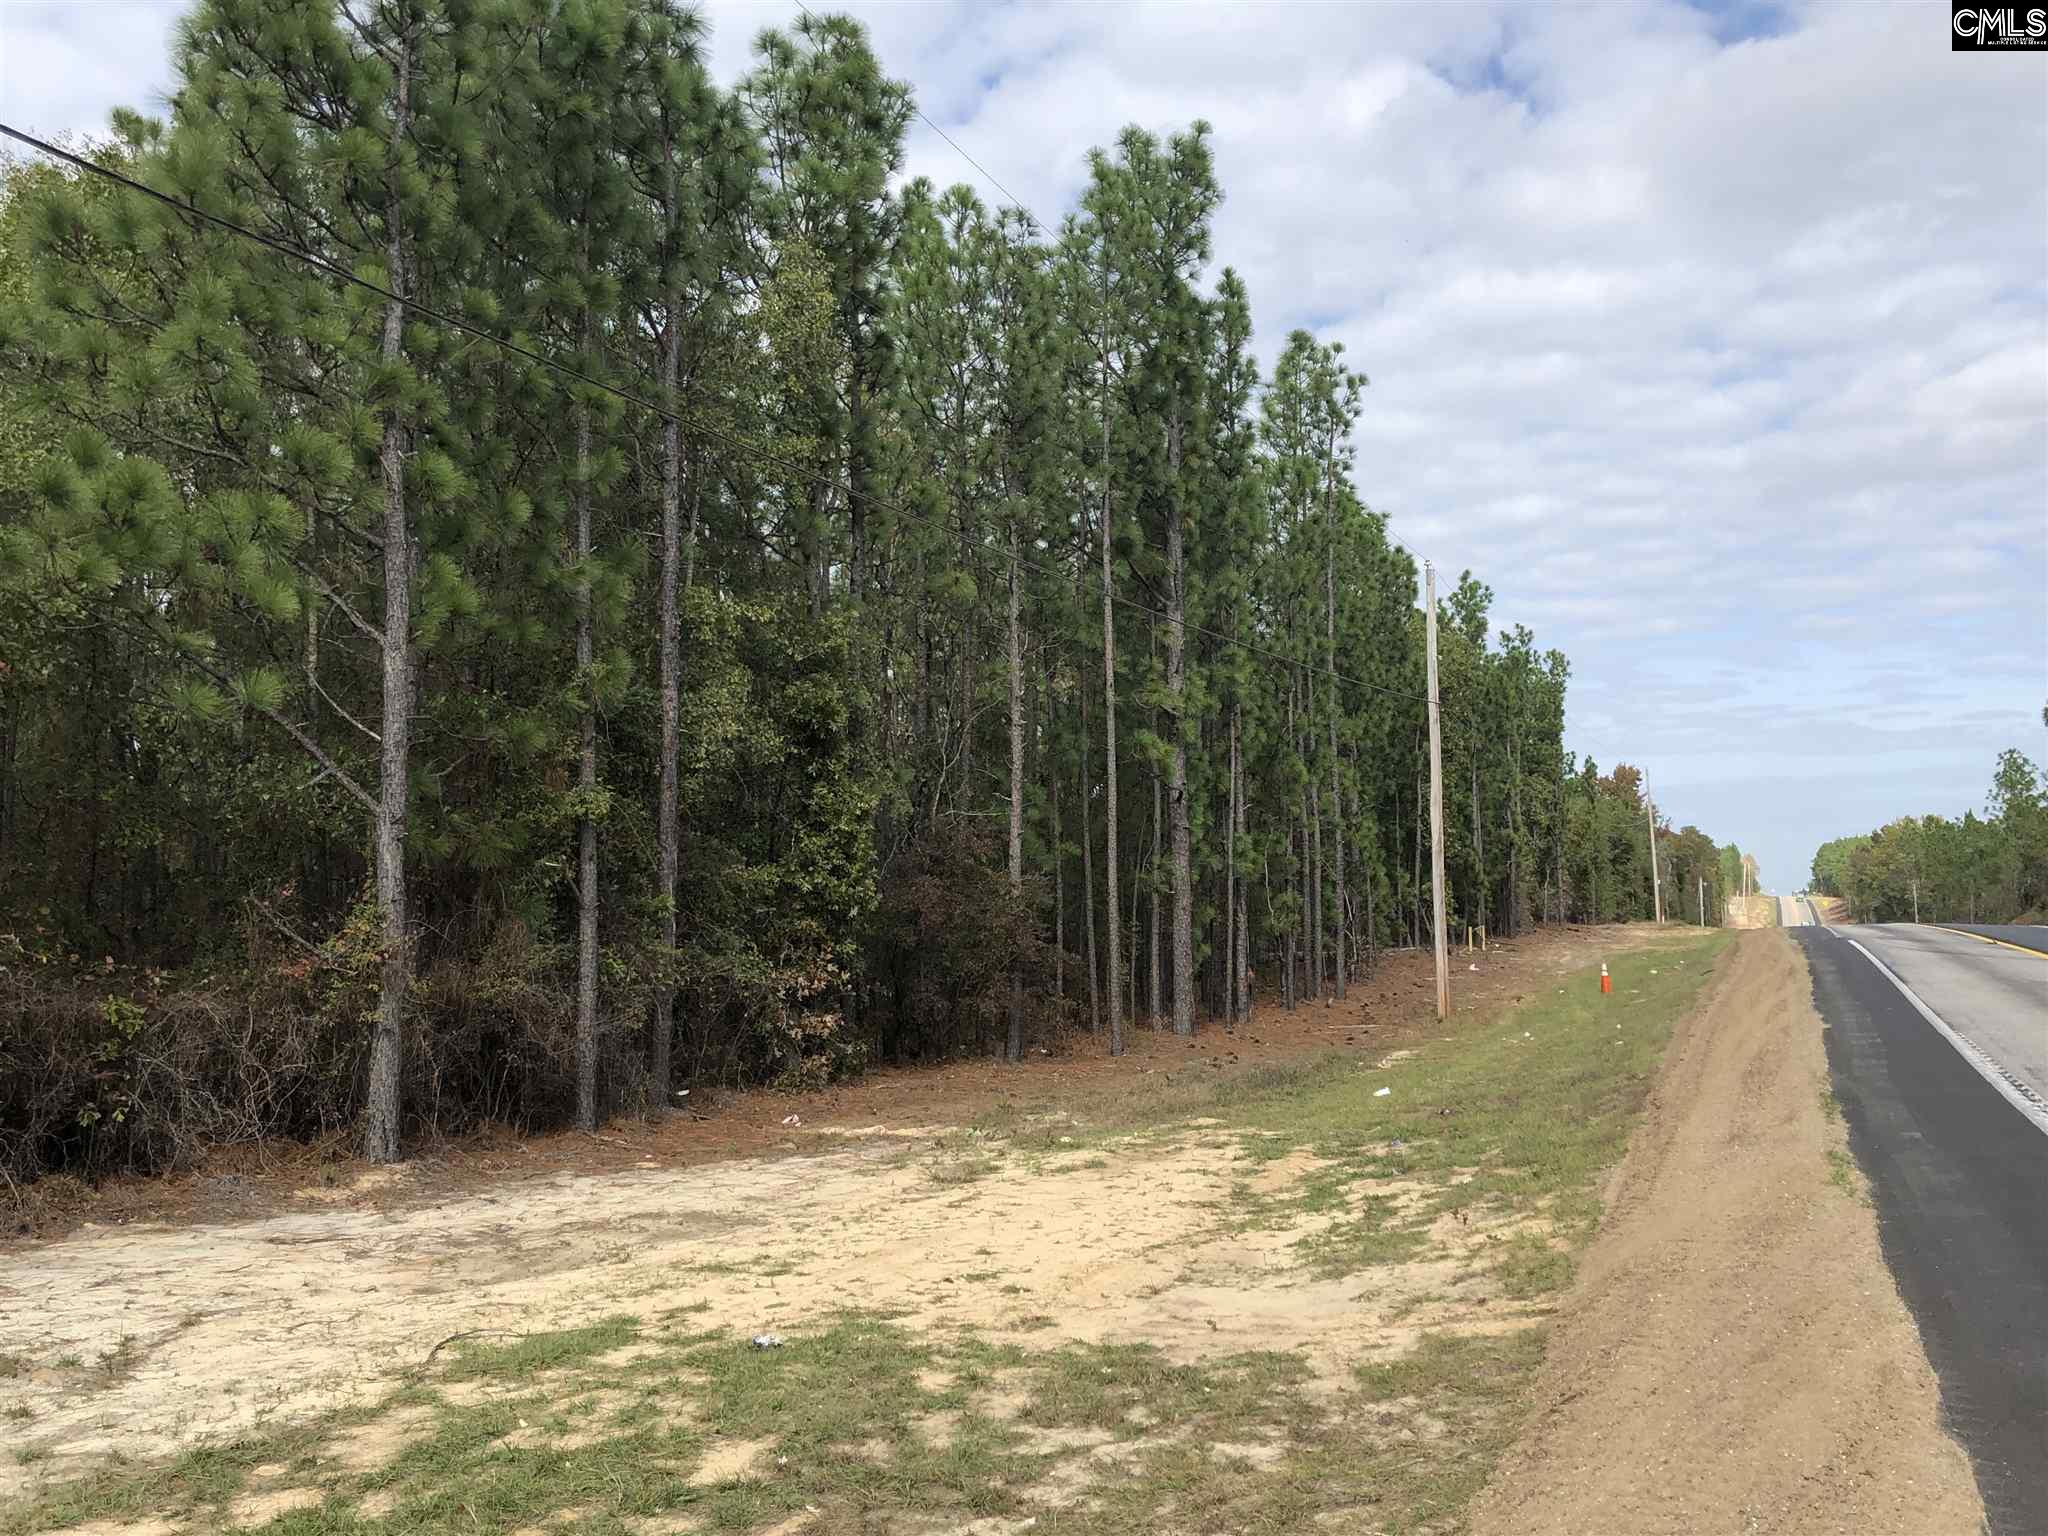 Edmund Highway Pelion, SC 29123